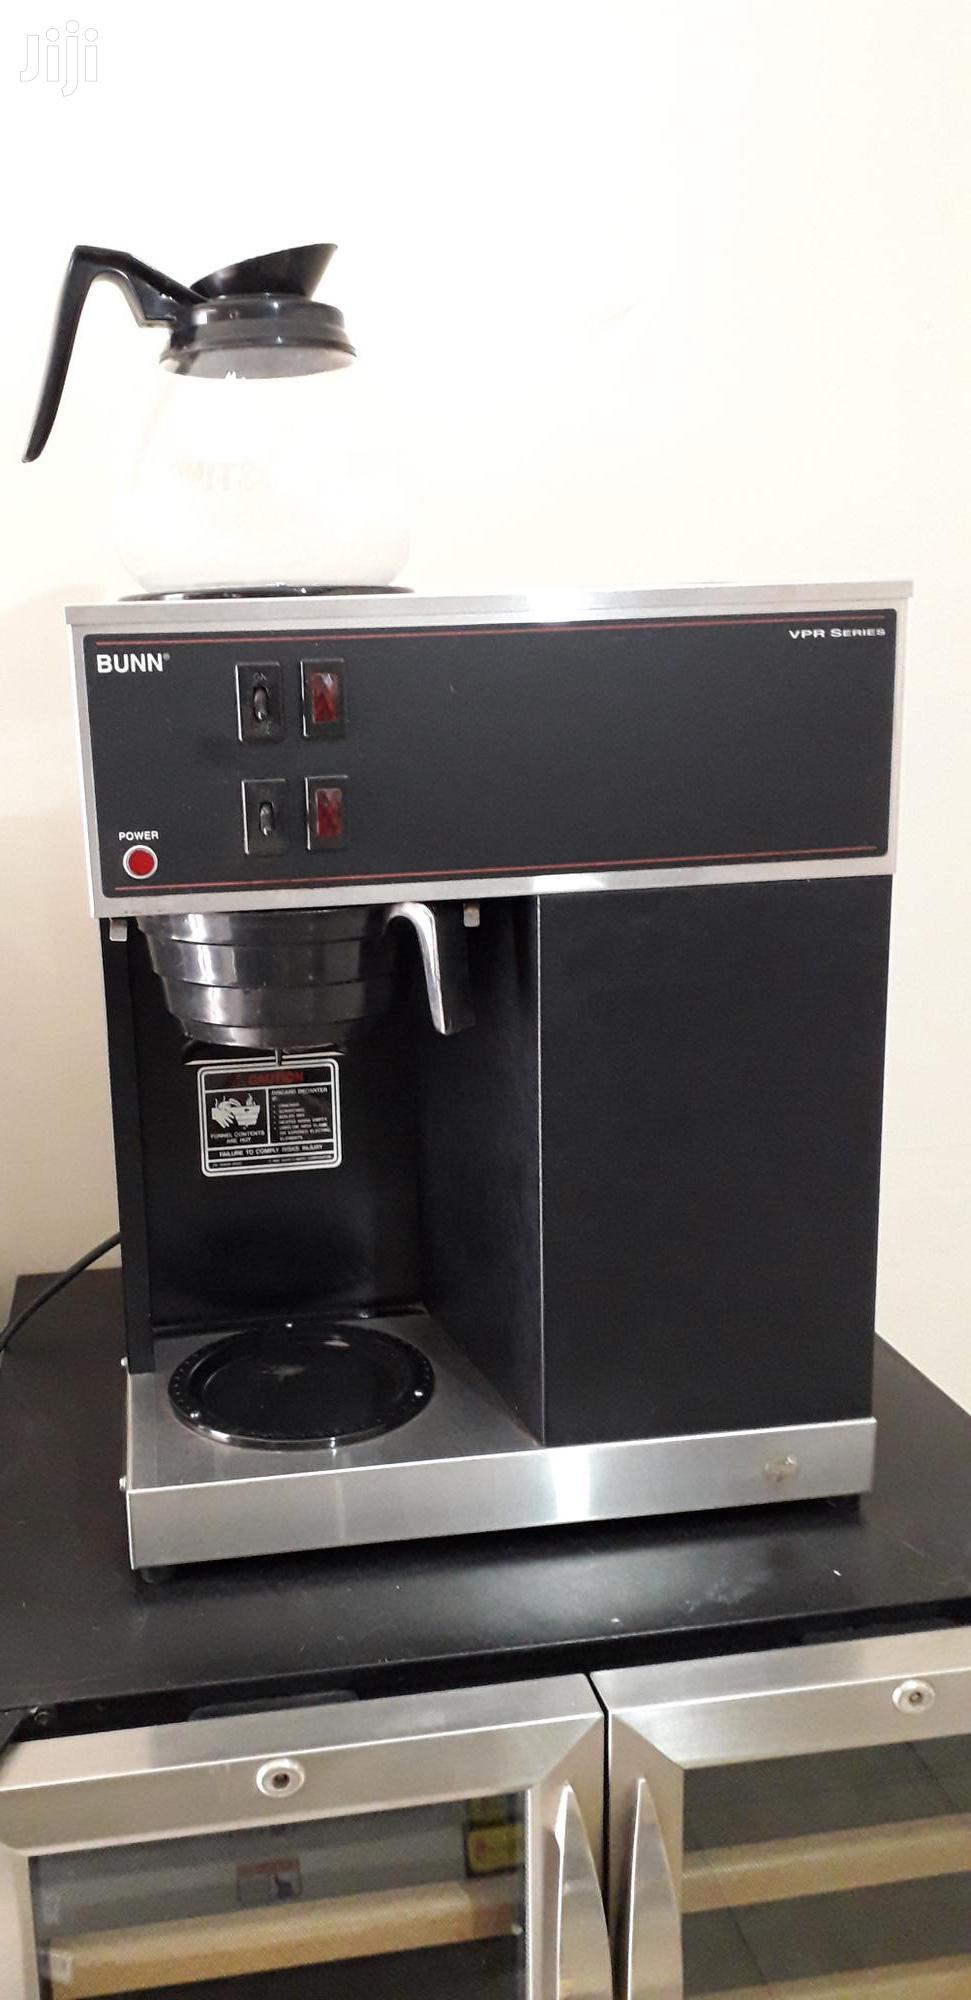 Bunn Industrial 2 Burners Coffee Maker   Restaurant & Catering Equipment for sale in Karen, Nairobi, Kenya